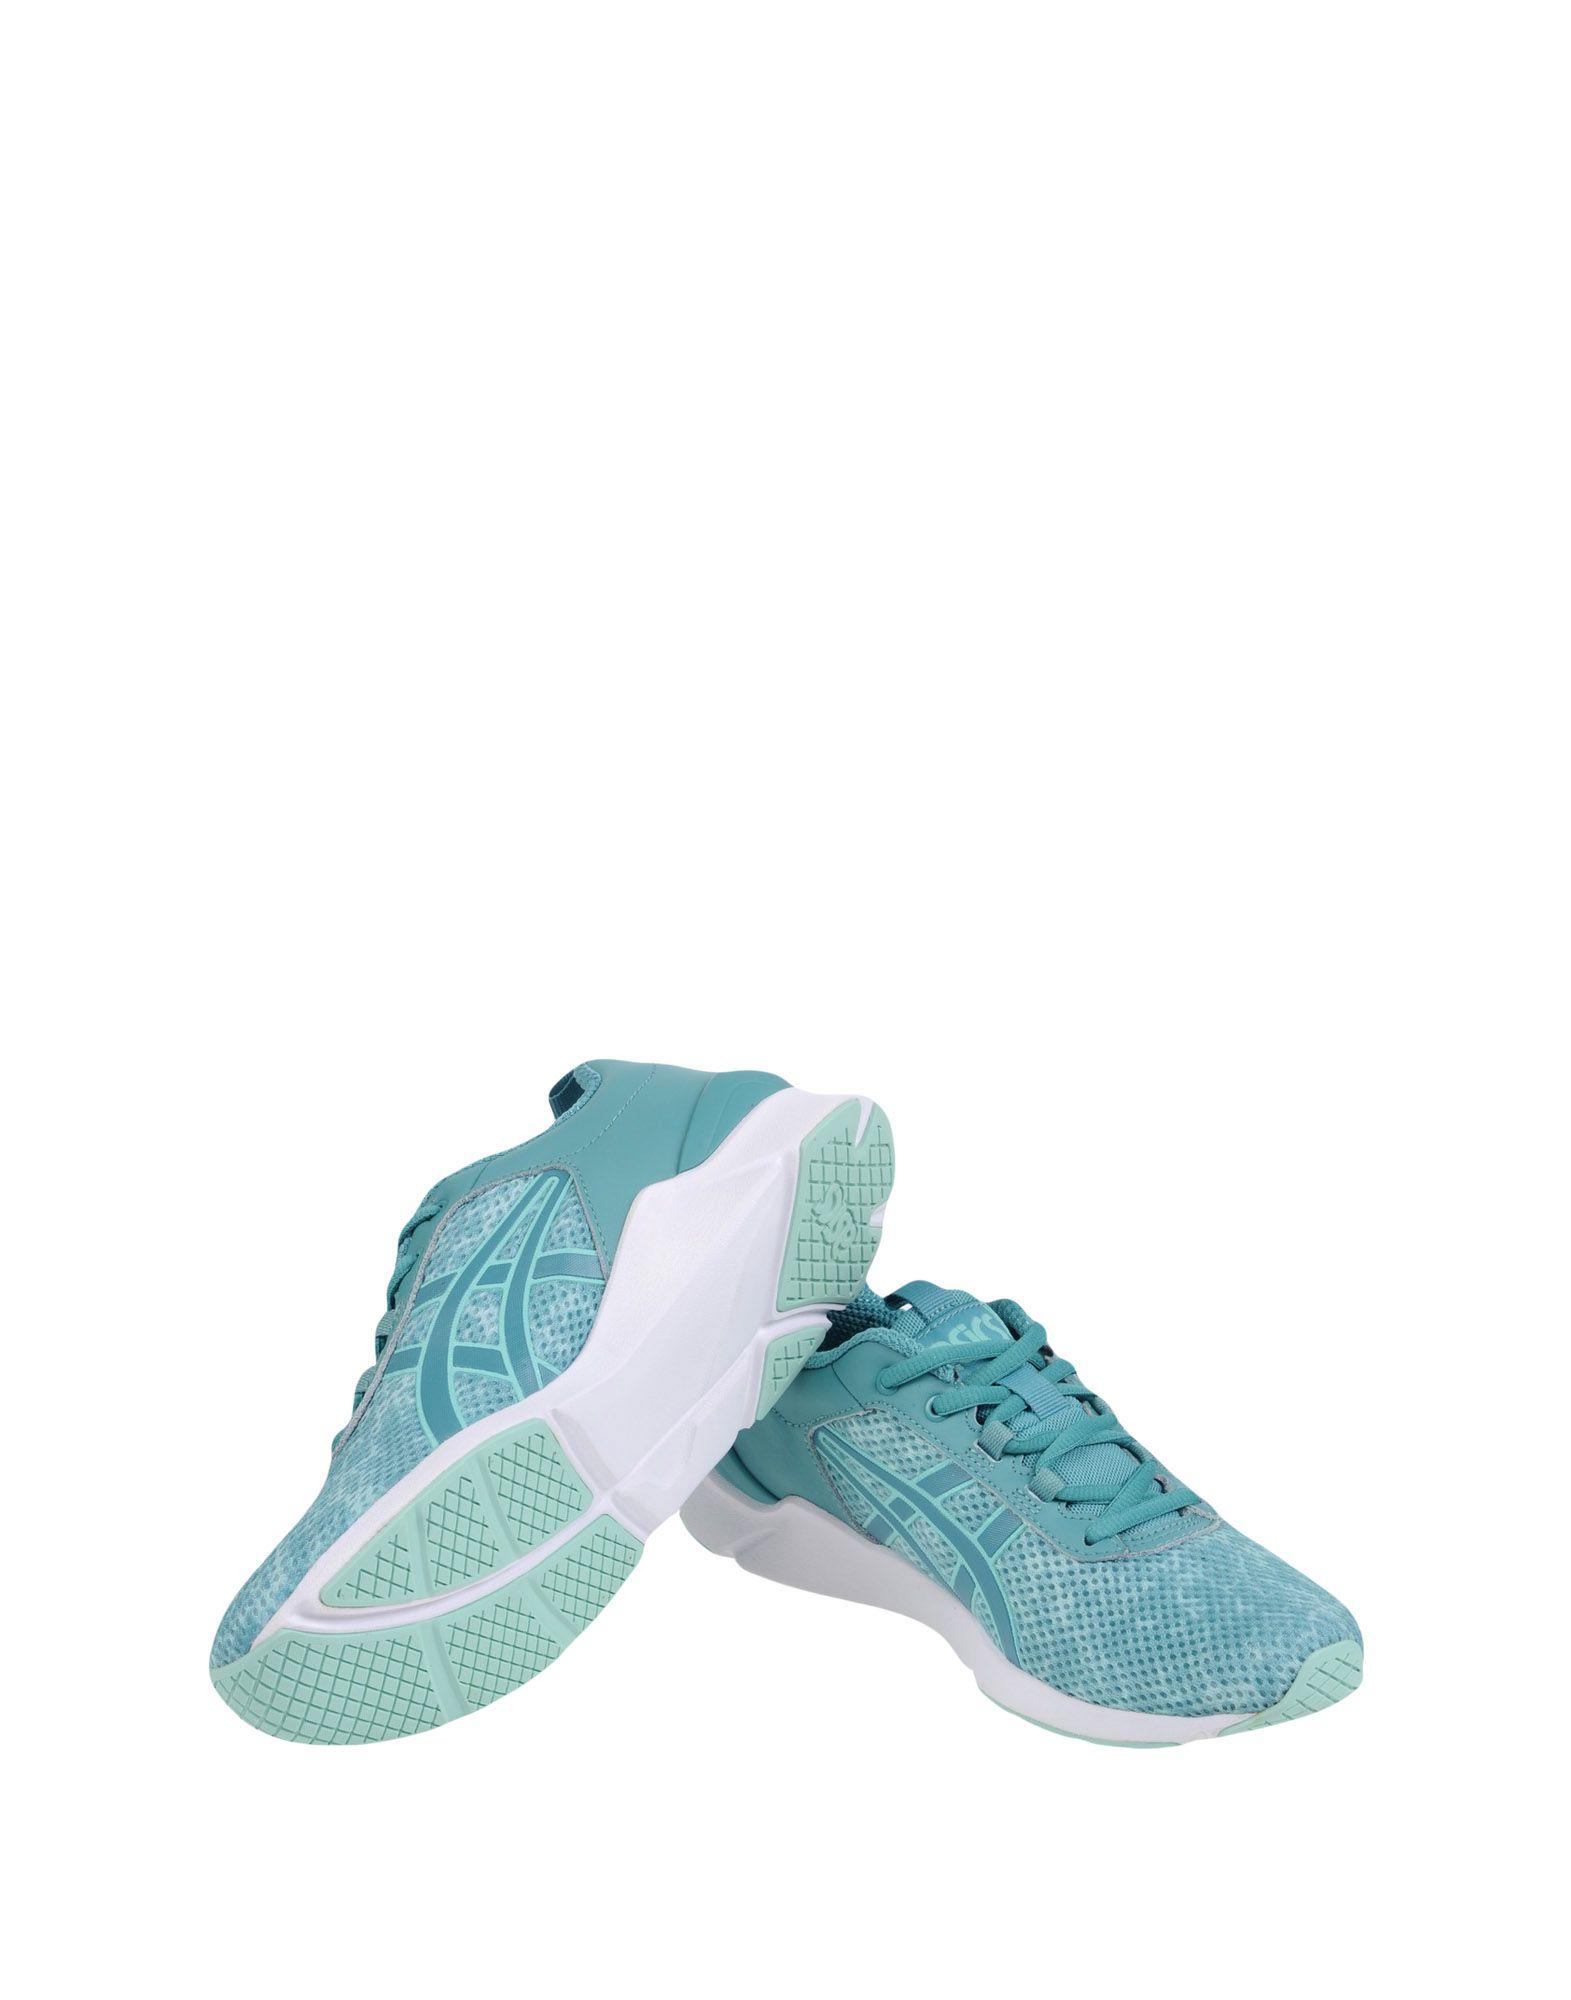 Sneakers Asics Tiger Gel-Lyte Runner - Femme - Sneakers Asics Tiger sur